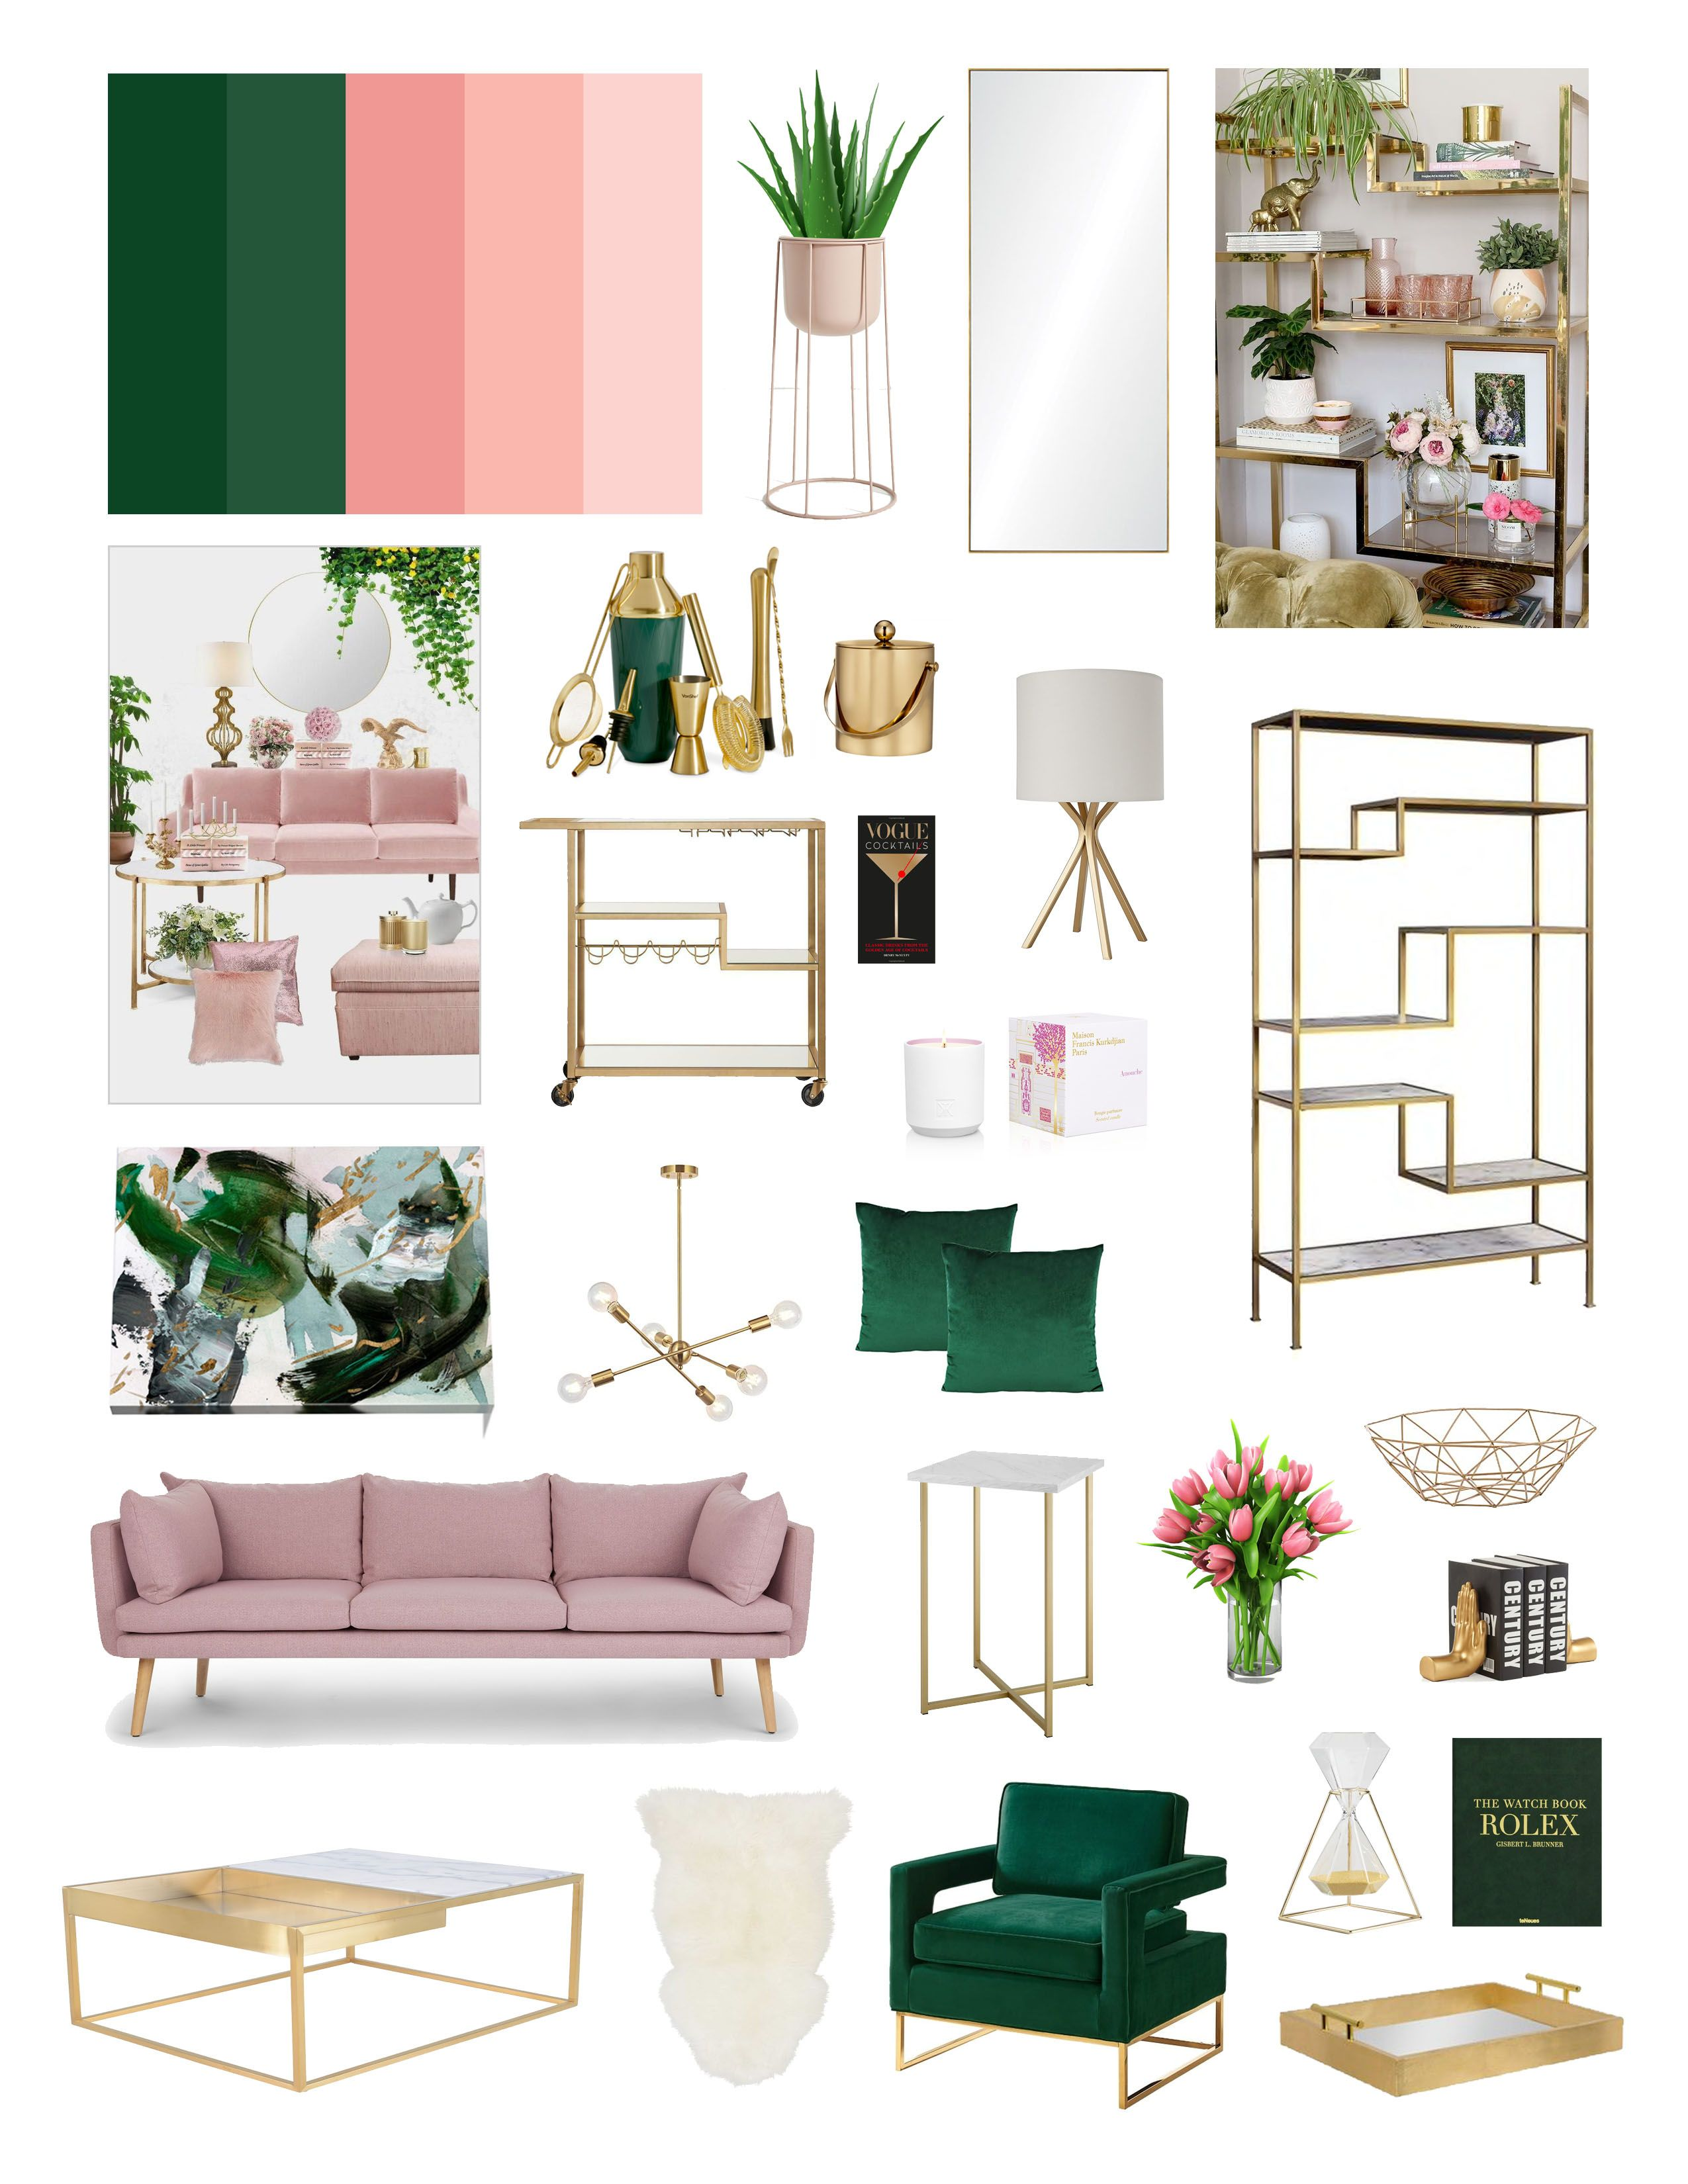 Pink Green Living Room Mood Board In 2020 Emerald Green Living Room Living Room Green Pink Green Bedrooms